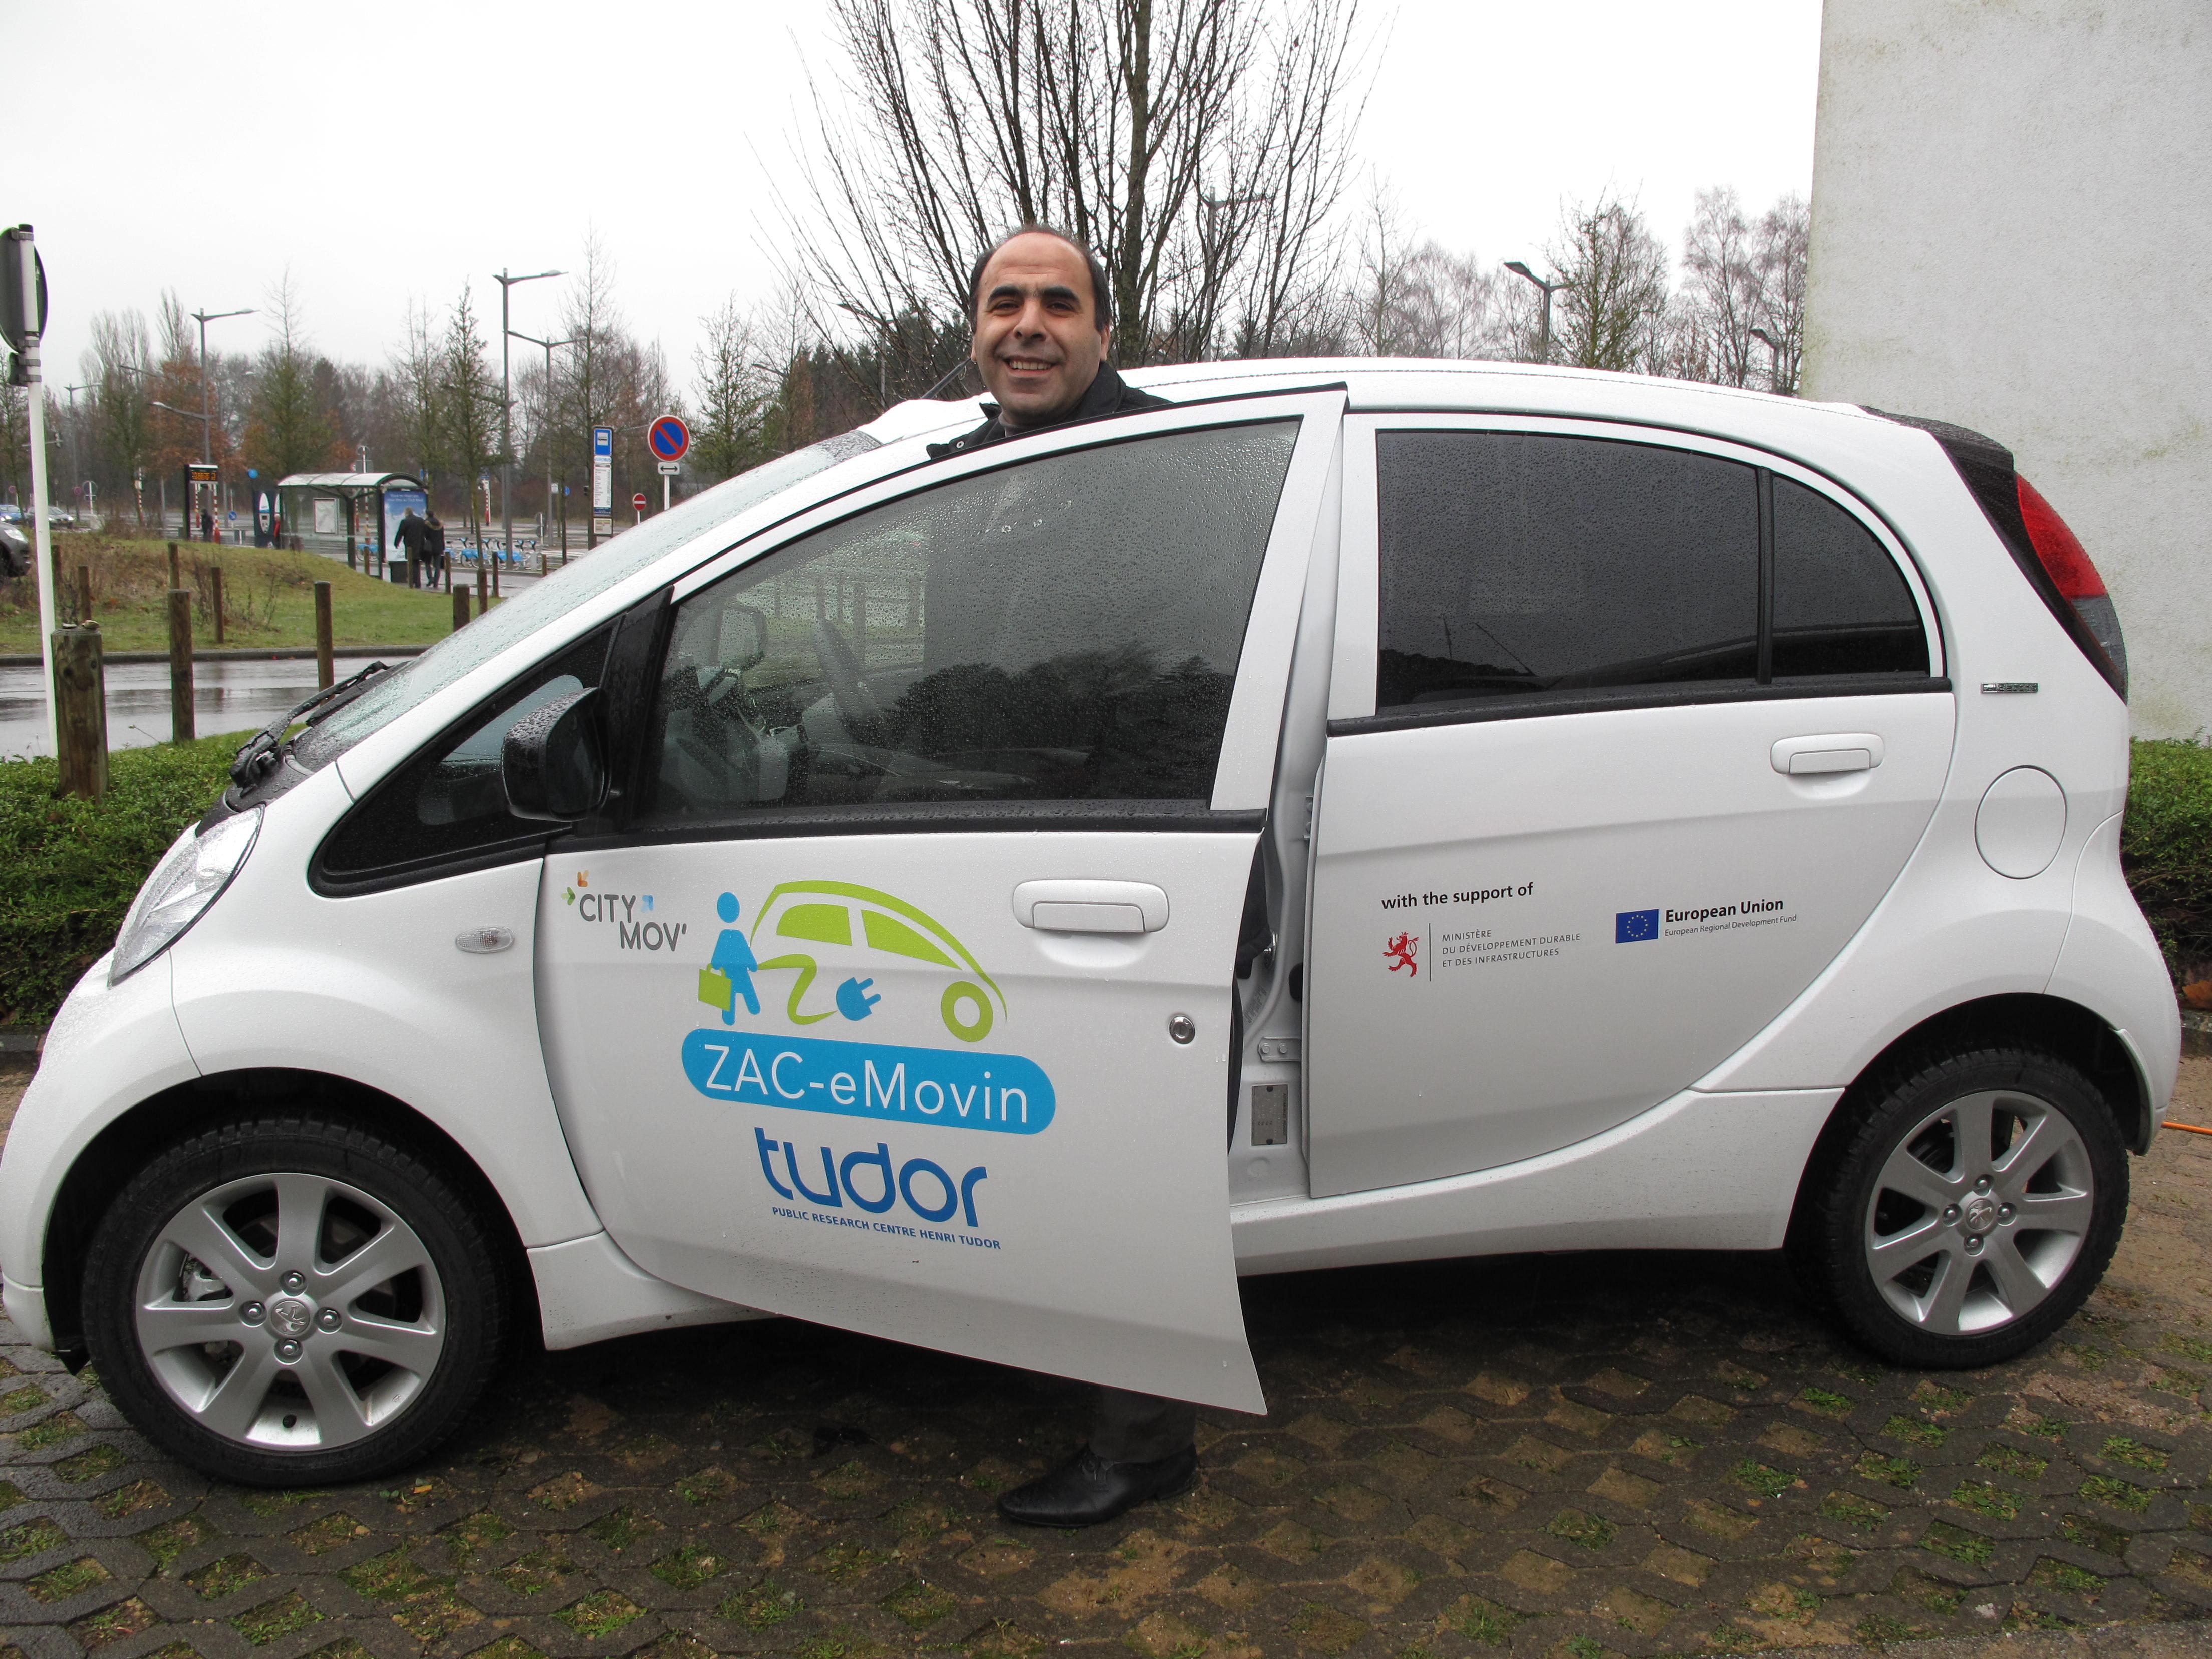 40.000 Elektro-Autos für Luxemburg | www.science.lu